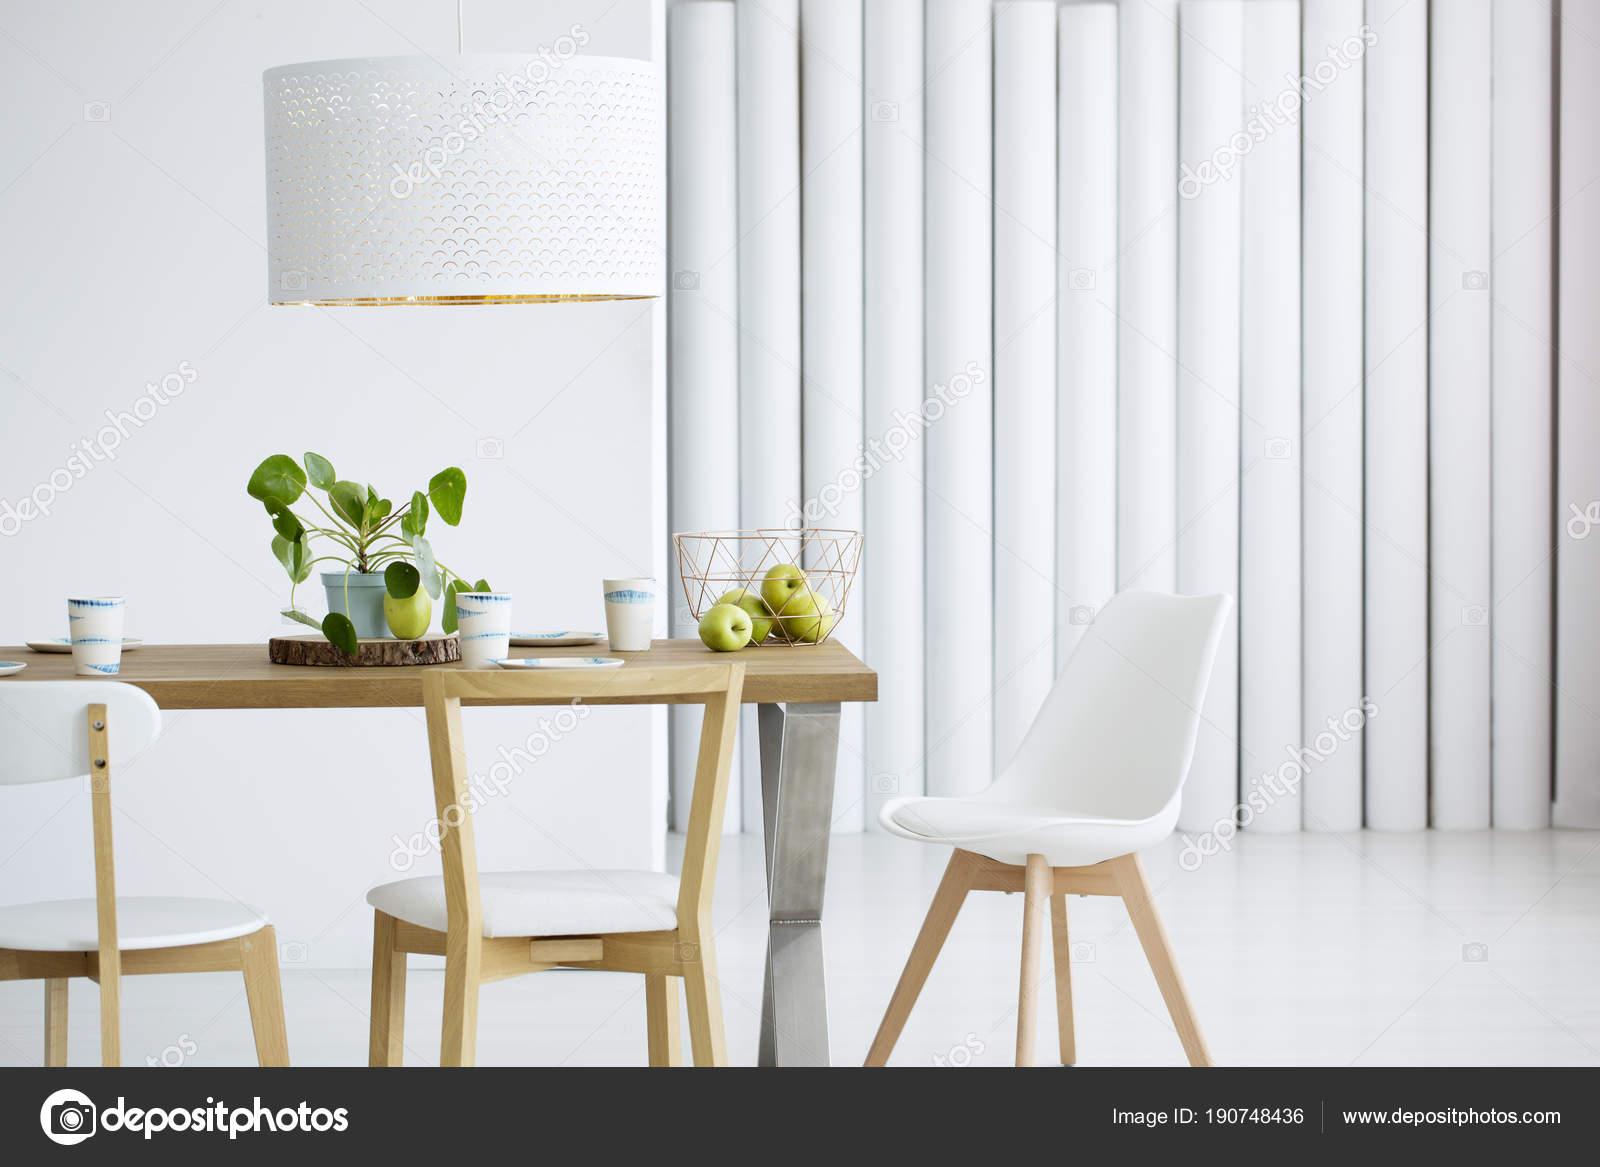 Richt je woonkamer warm en minimalistisch in living